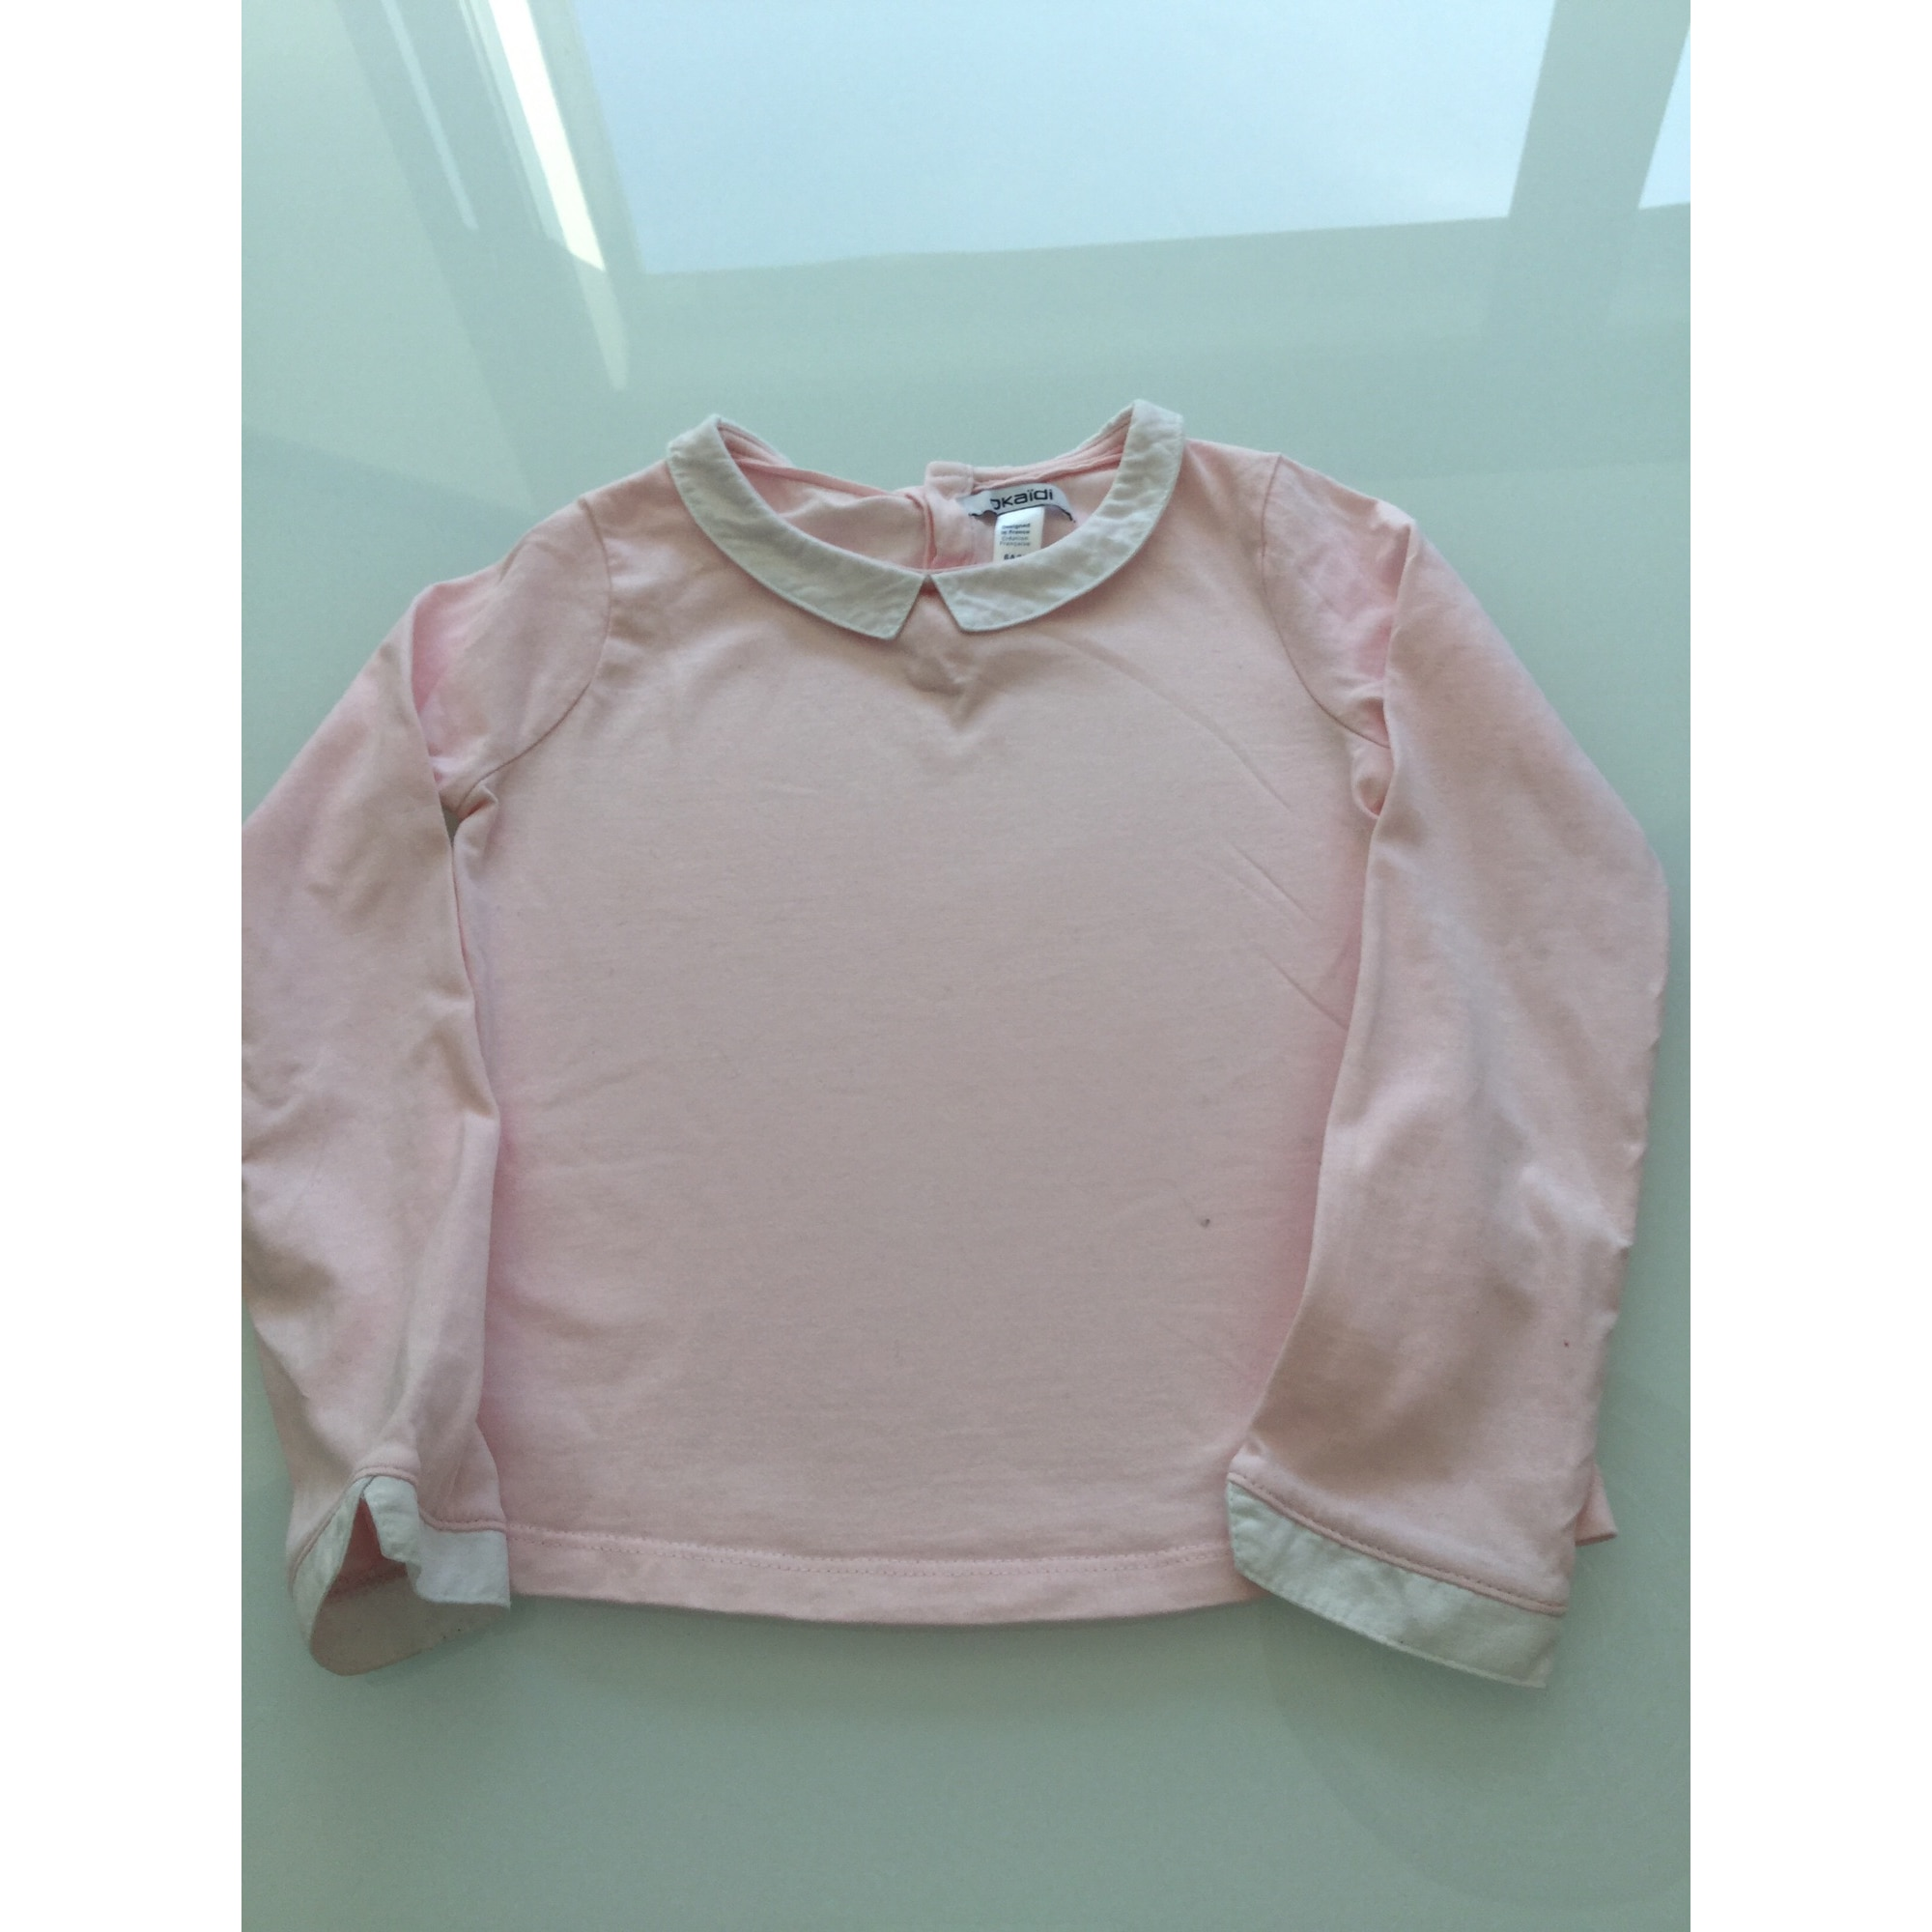 Top, Tee-shirt OKAÏDI Rose, fuschia, vieux rose